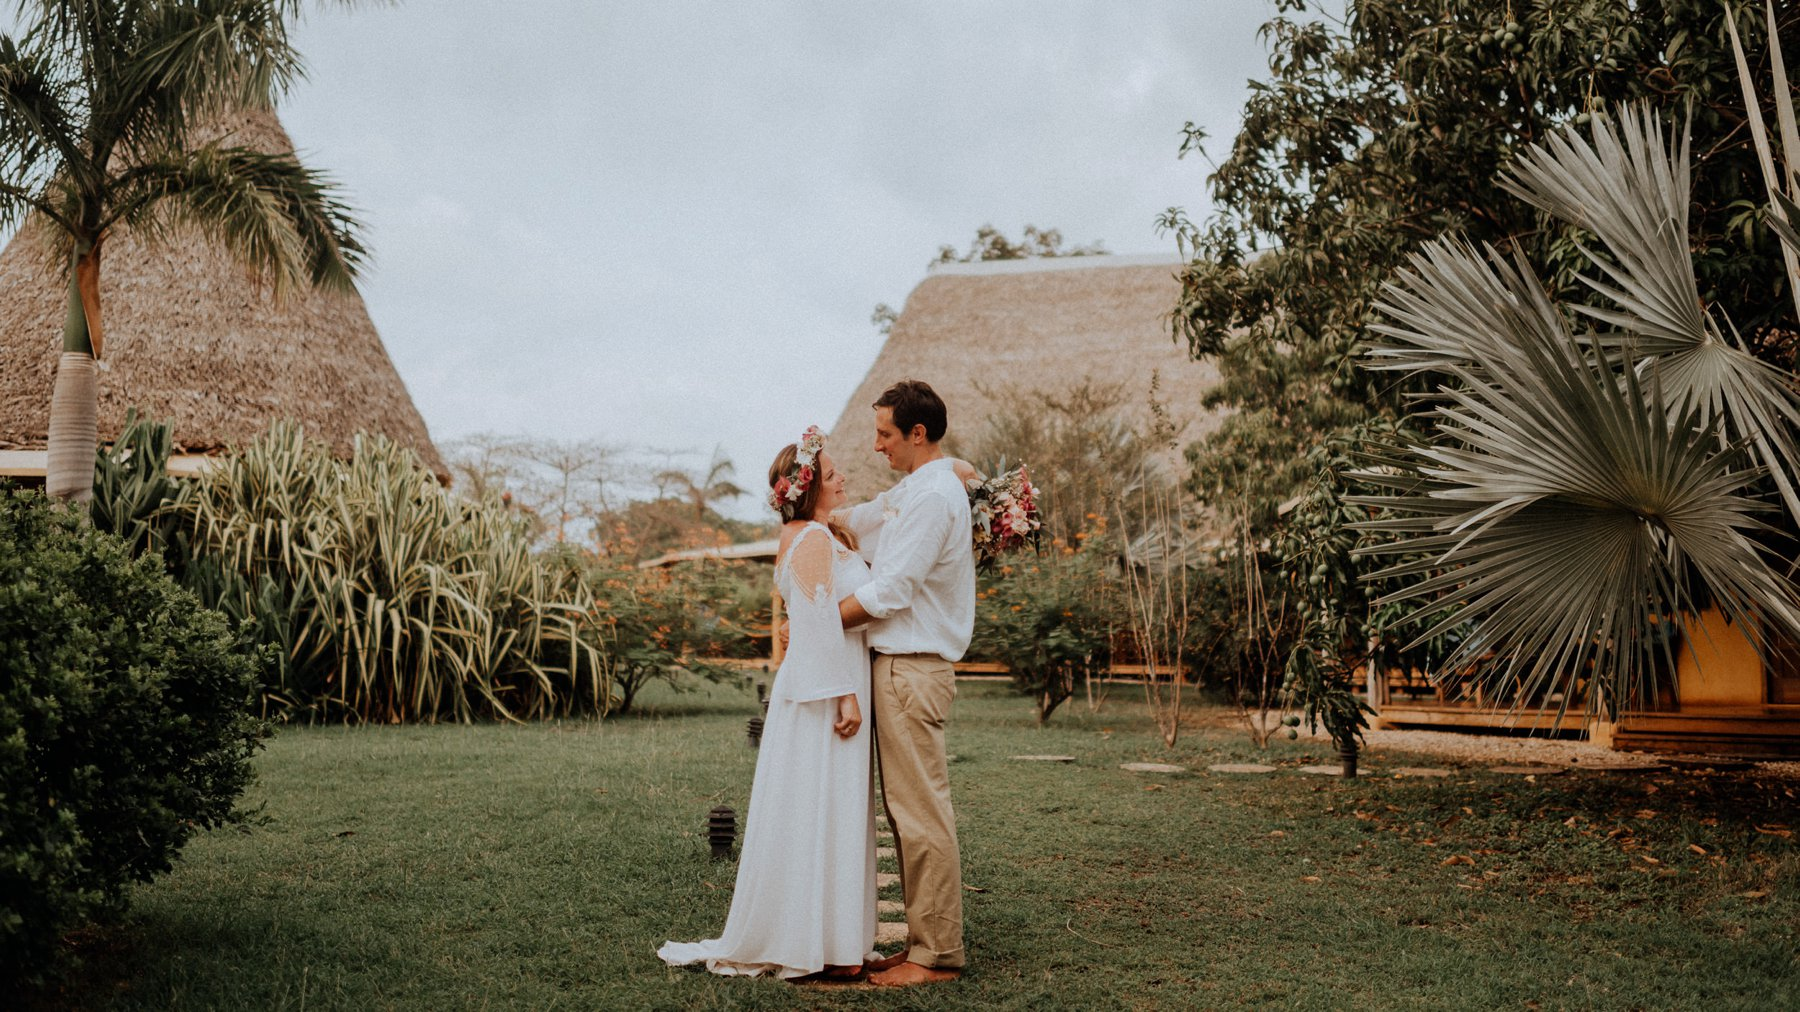 004-031-costa-rica-wedding-photographer-13.jpg